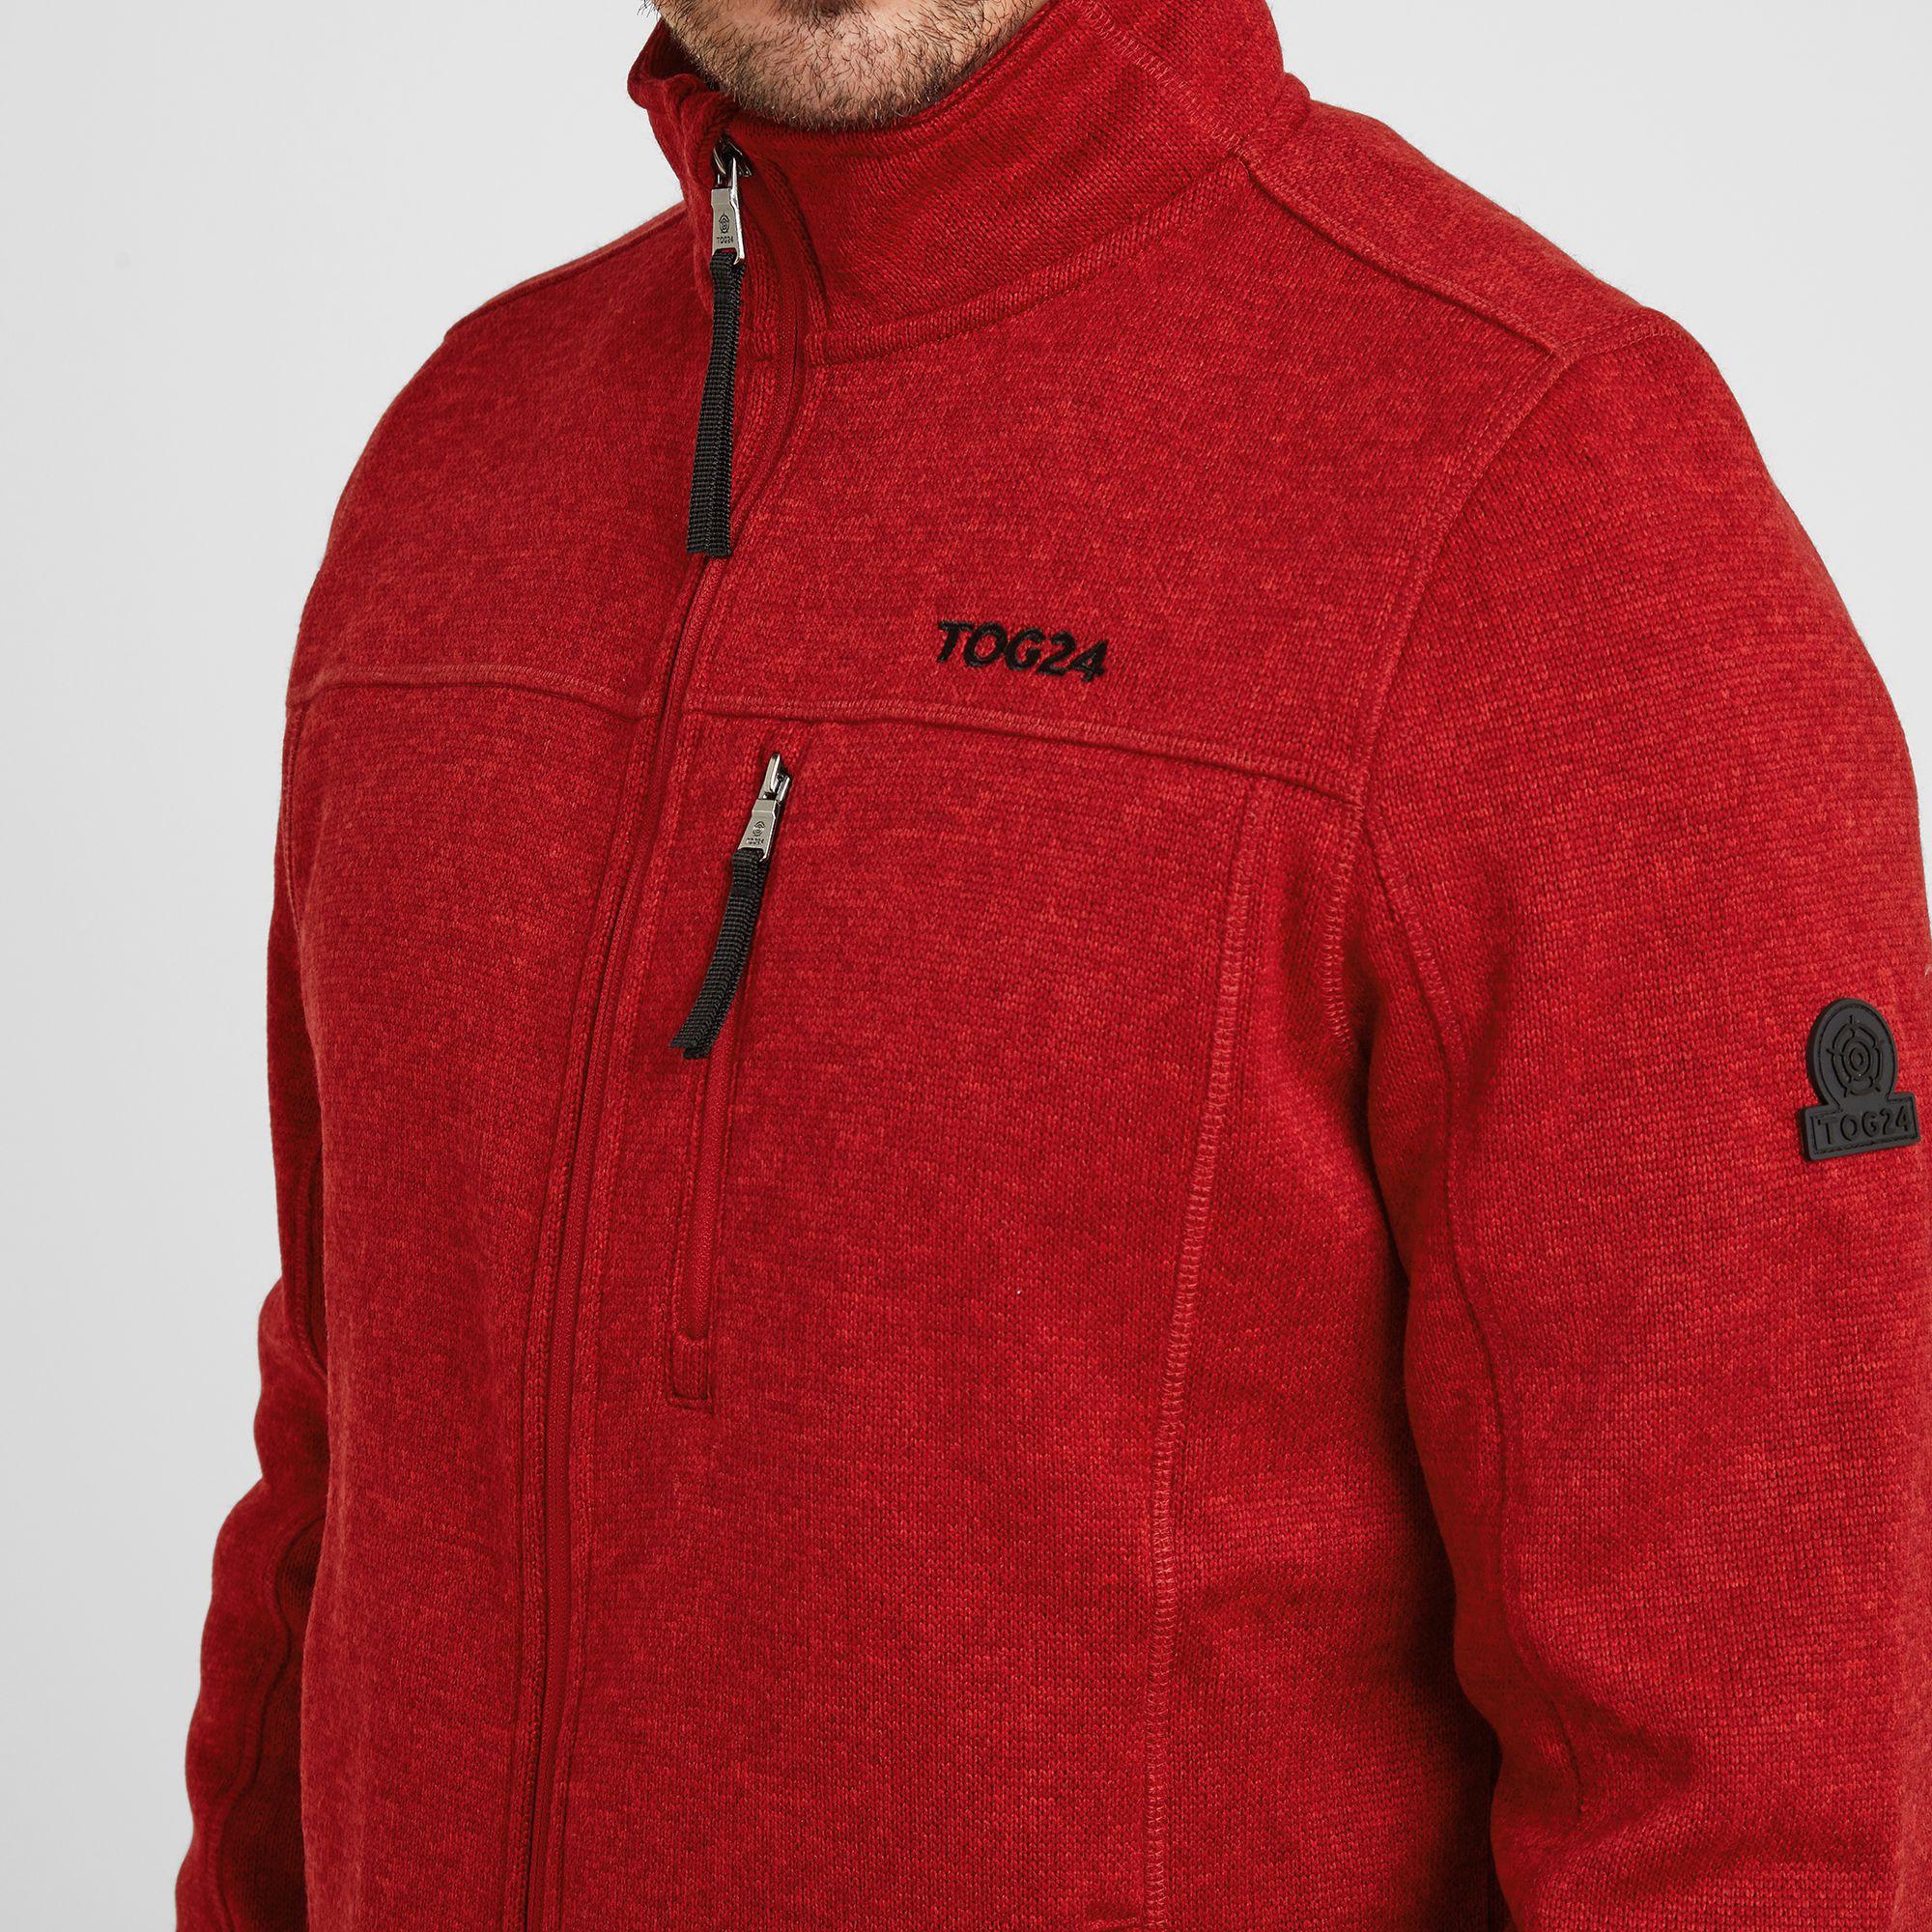 Sedman Mens Knitlook Fleece Jacket Chilli Red